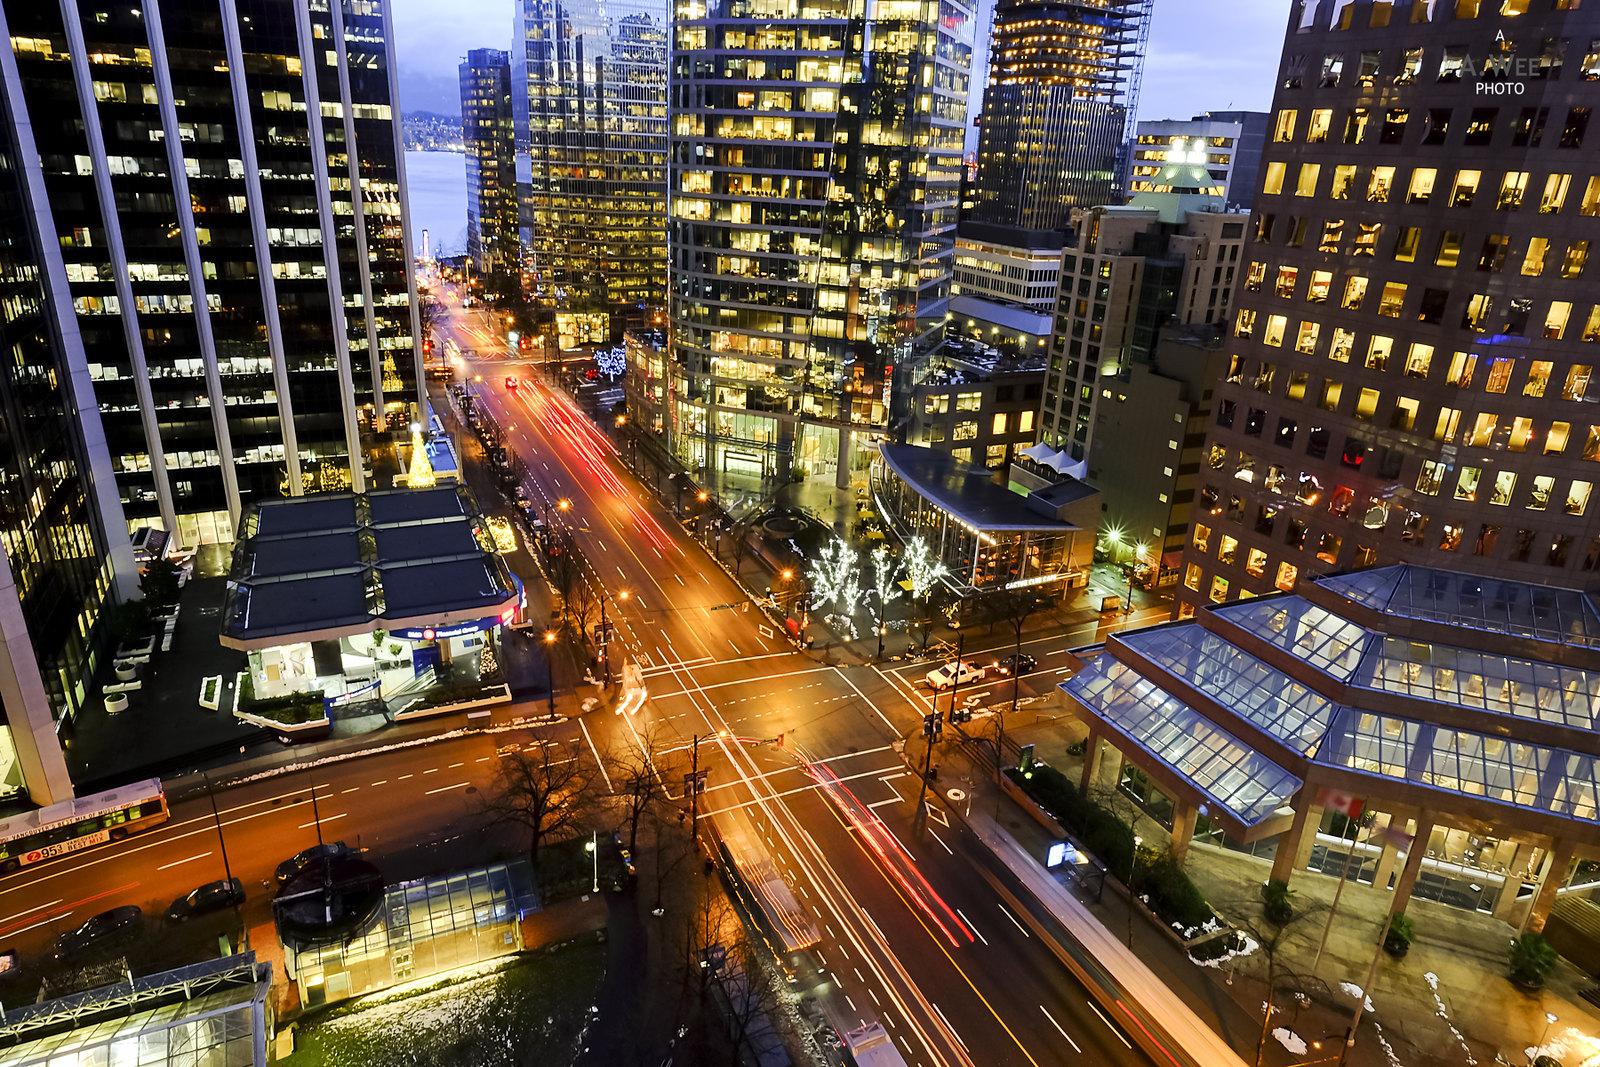 Burrard Street in Vancouver